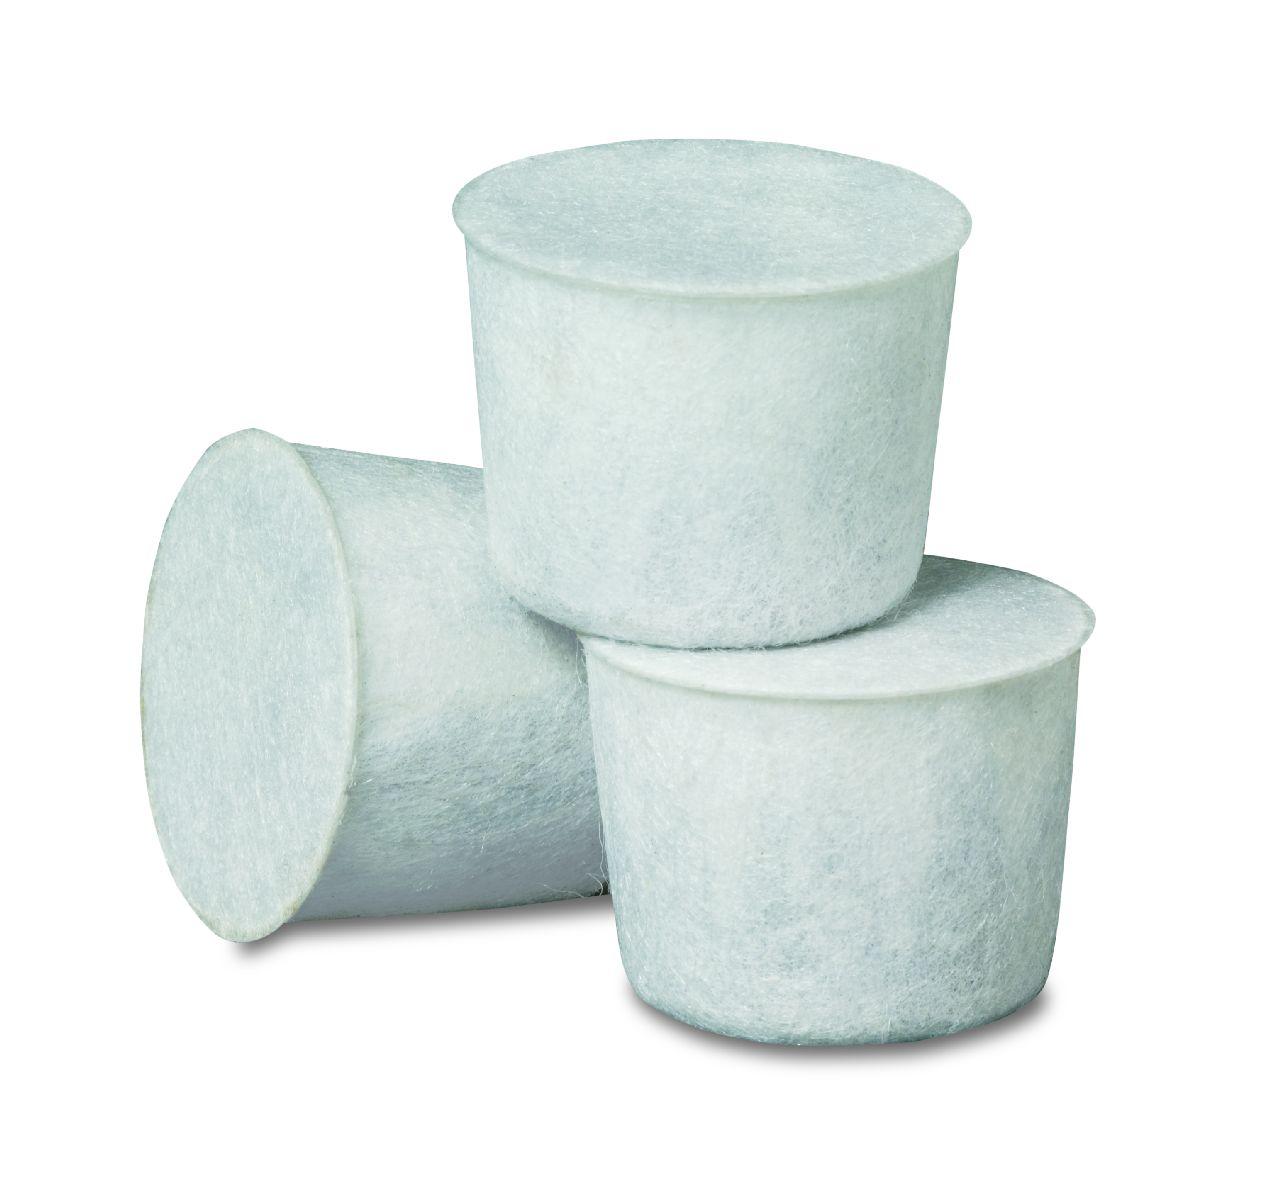 KitchenAid Universal Water Filter Pods - 3 per Box